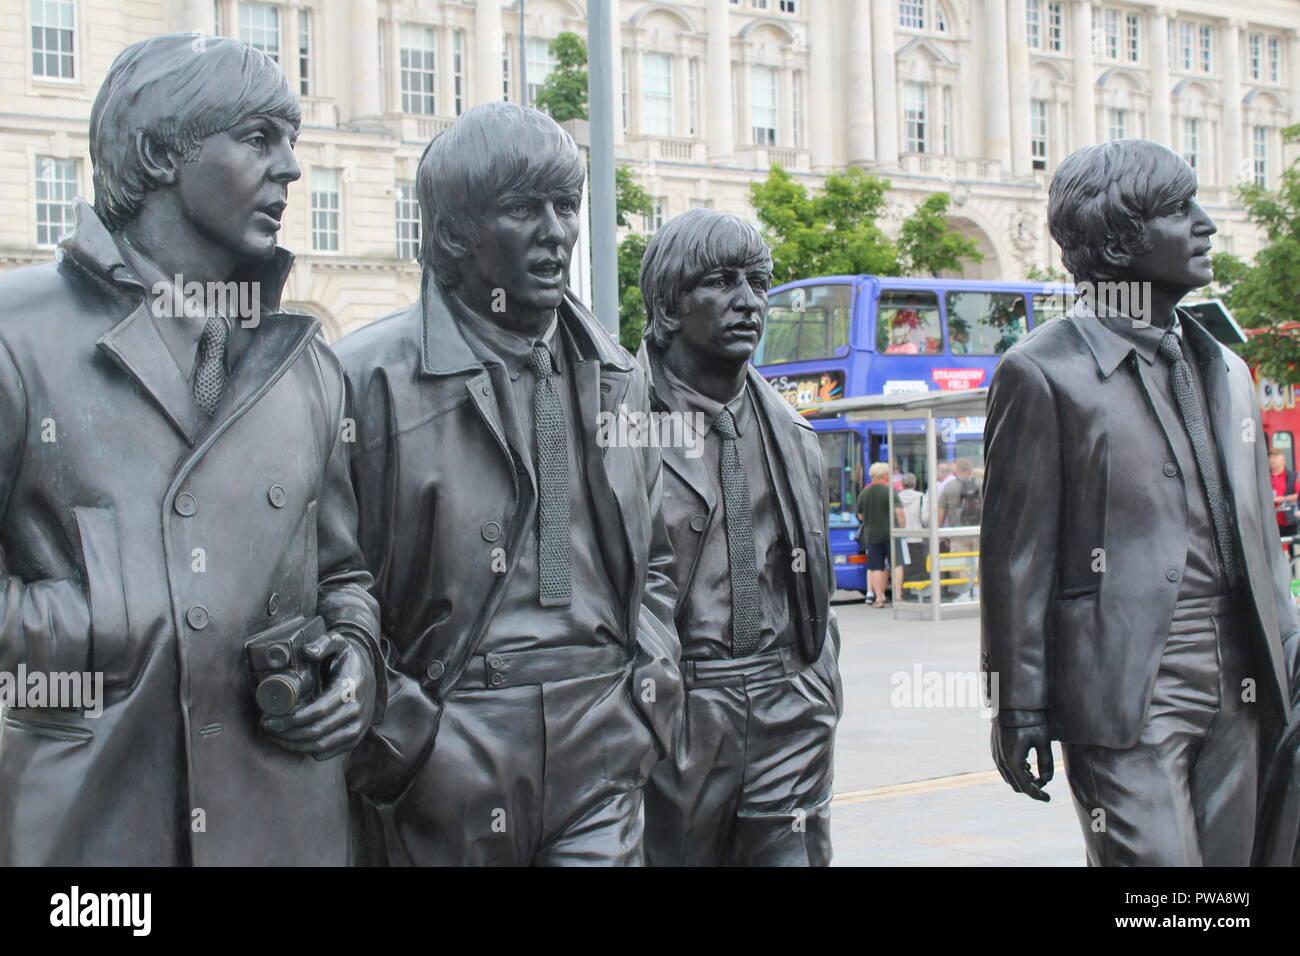 La estatua de los Beatles en Liverpool Albert Dock. Famoso monumento a John, Paul, George Harrison y Ringo Starr (the Fab Four) Foto de stock